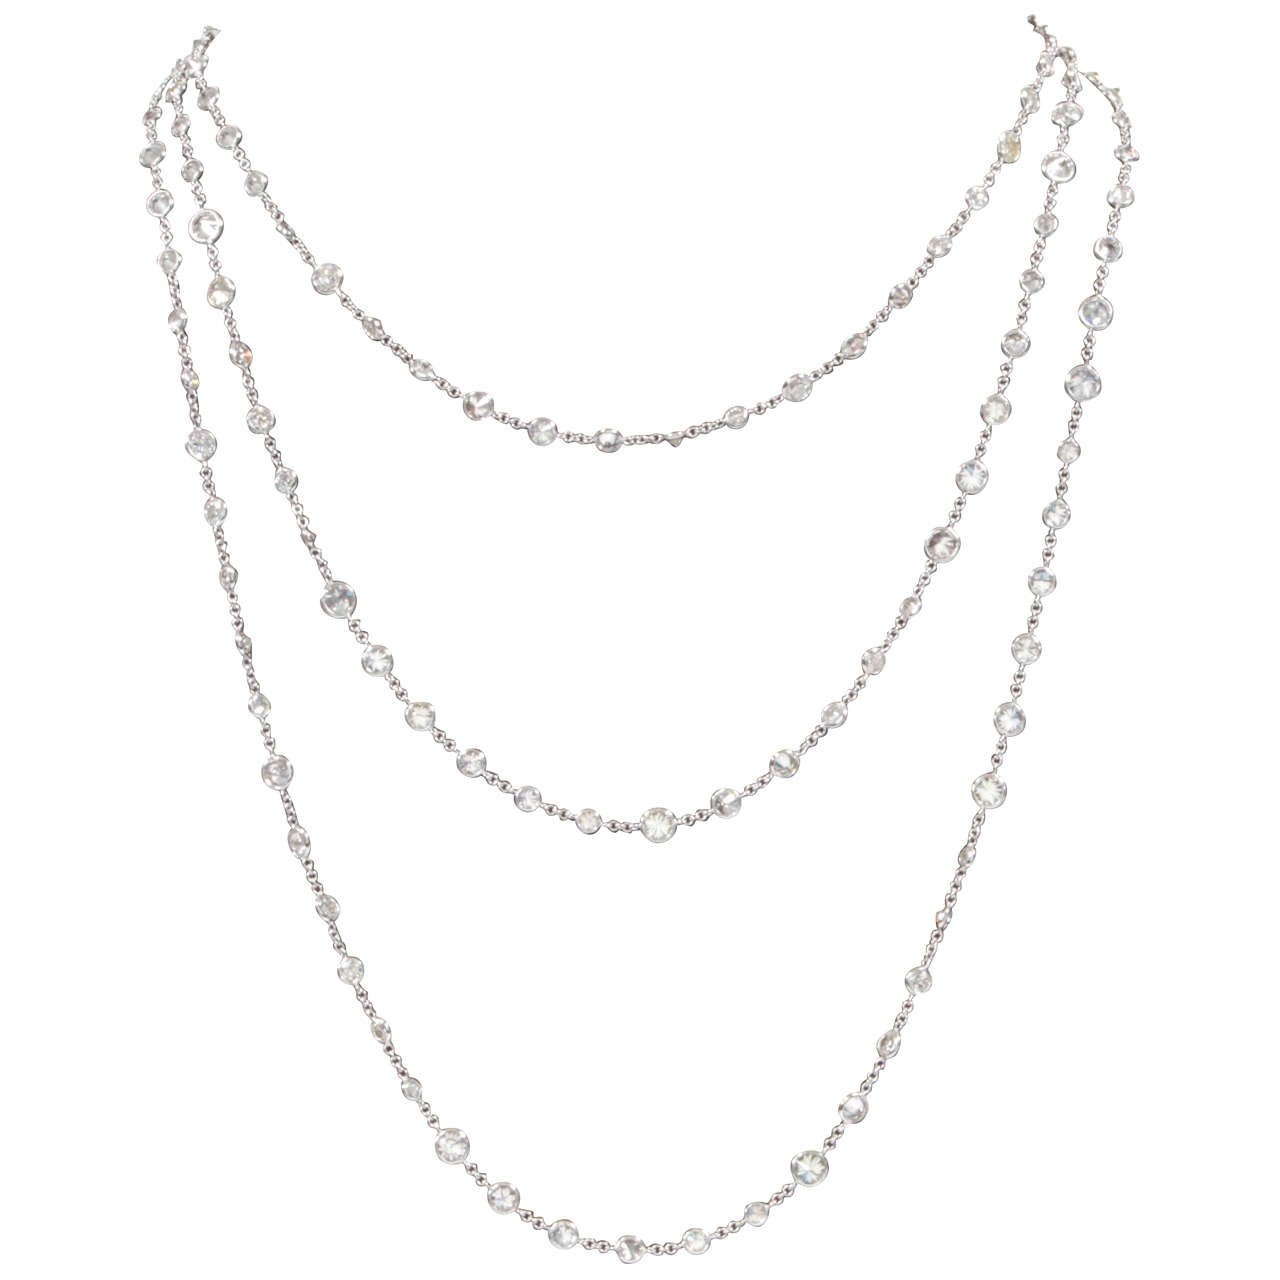 44 Carat Round Diamond Chain 72 Inches Multiple Sizes